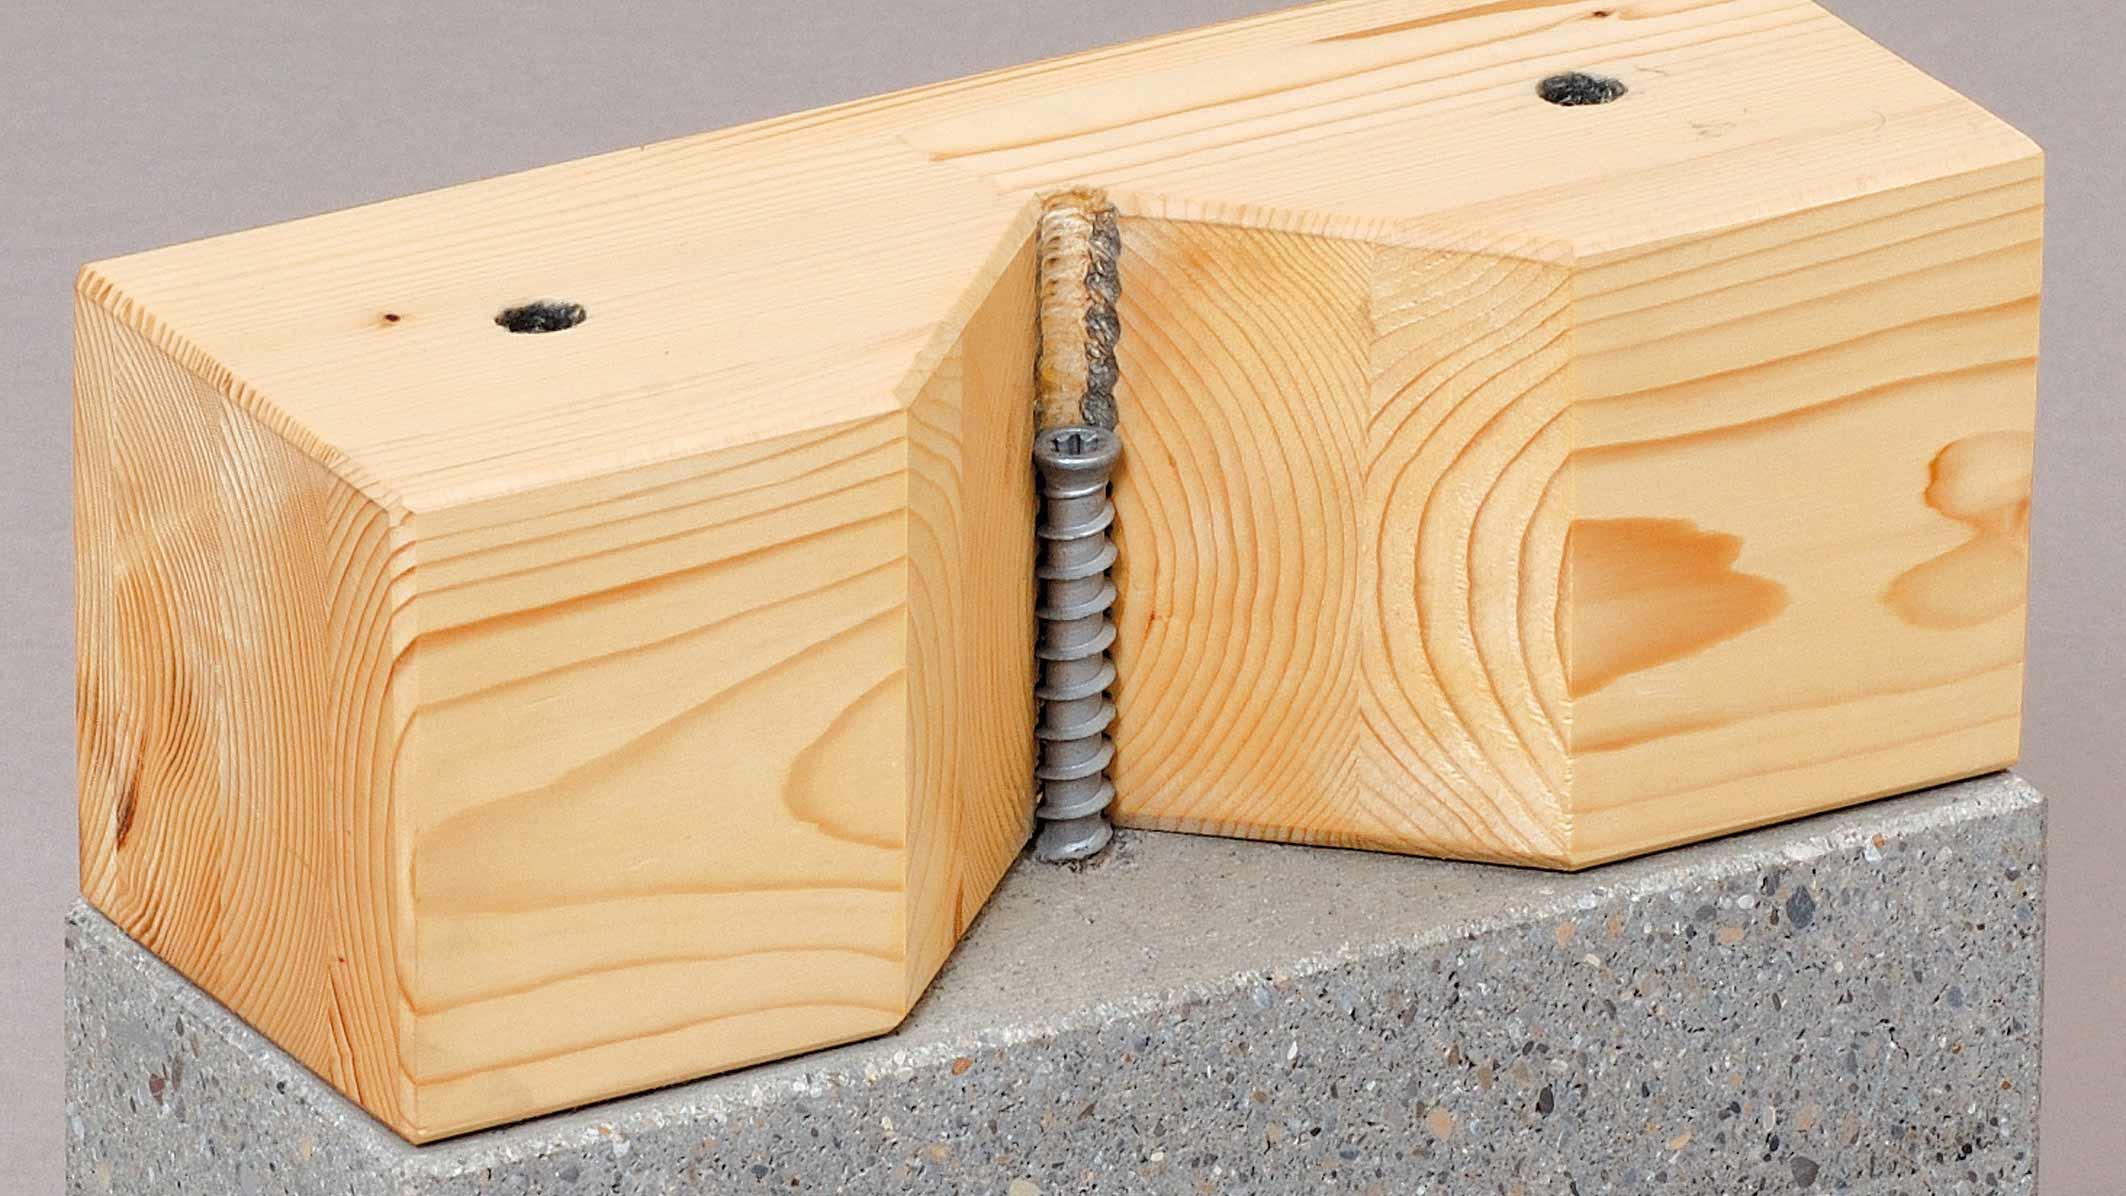 MULTI-MONTI®-TimberConnect | HECO Schrauben